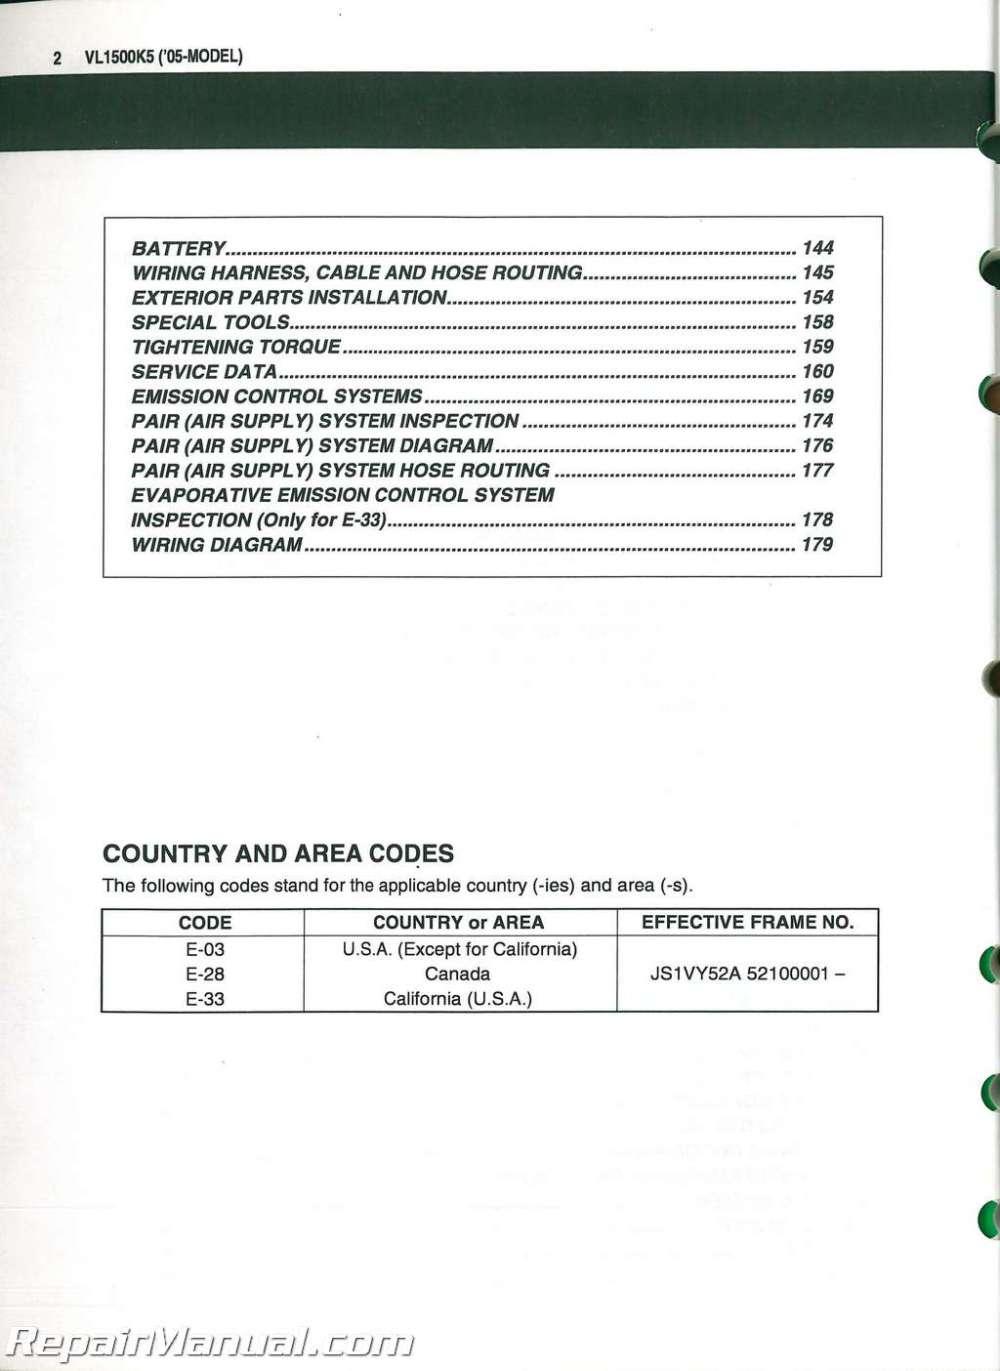 medium resolution of used 2005 suzuki vl1500 intruder c90 motorcycle service manual supplement